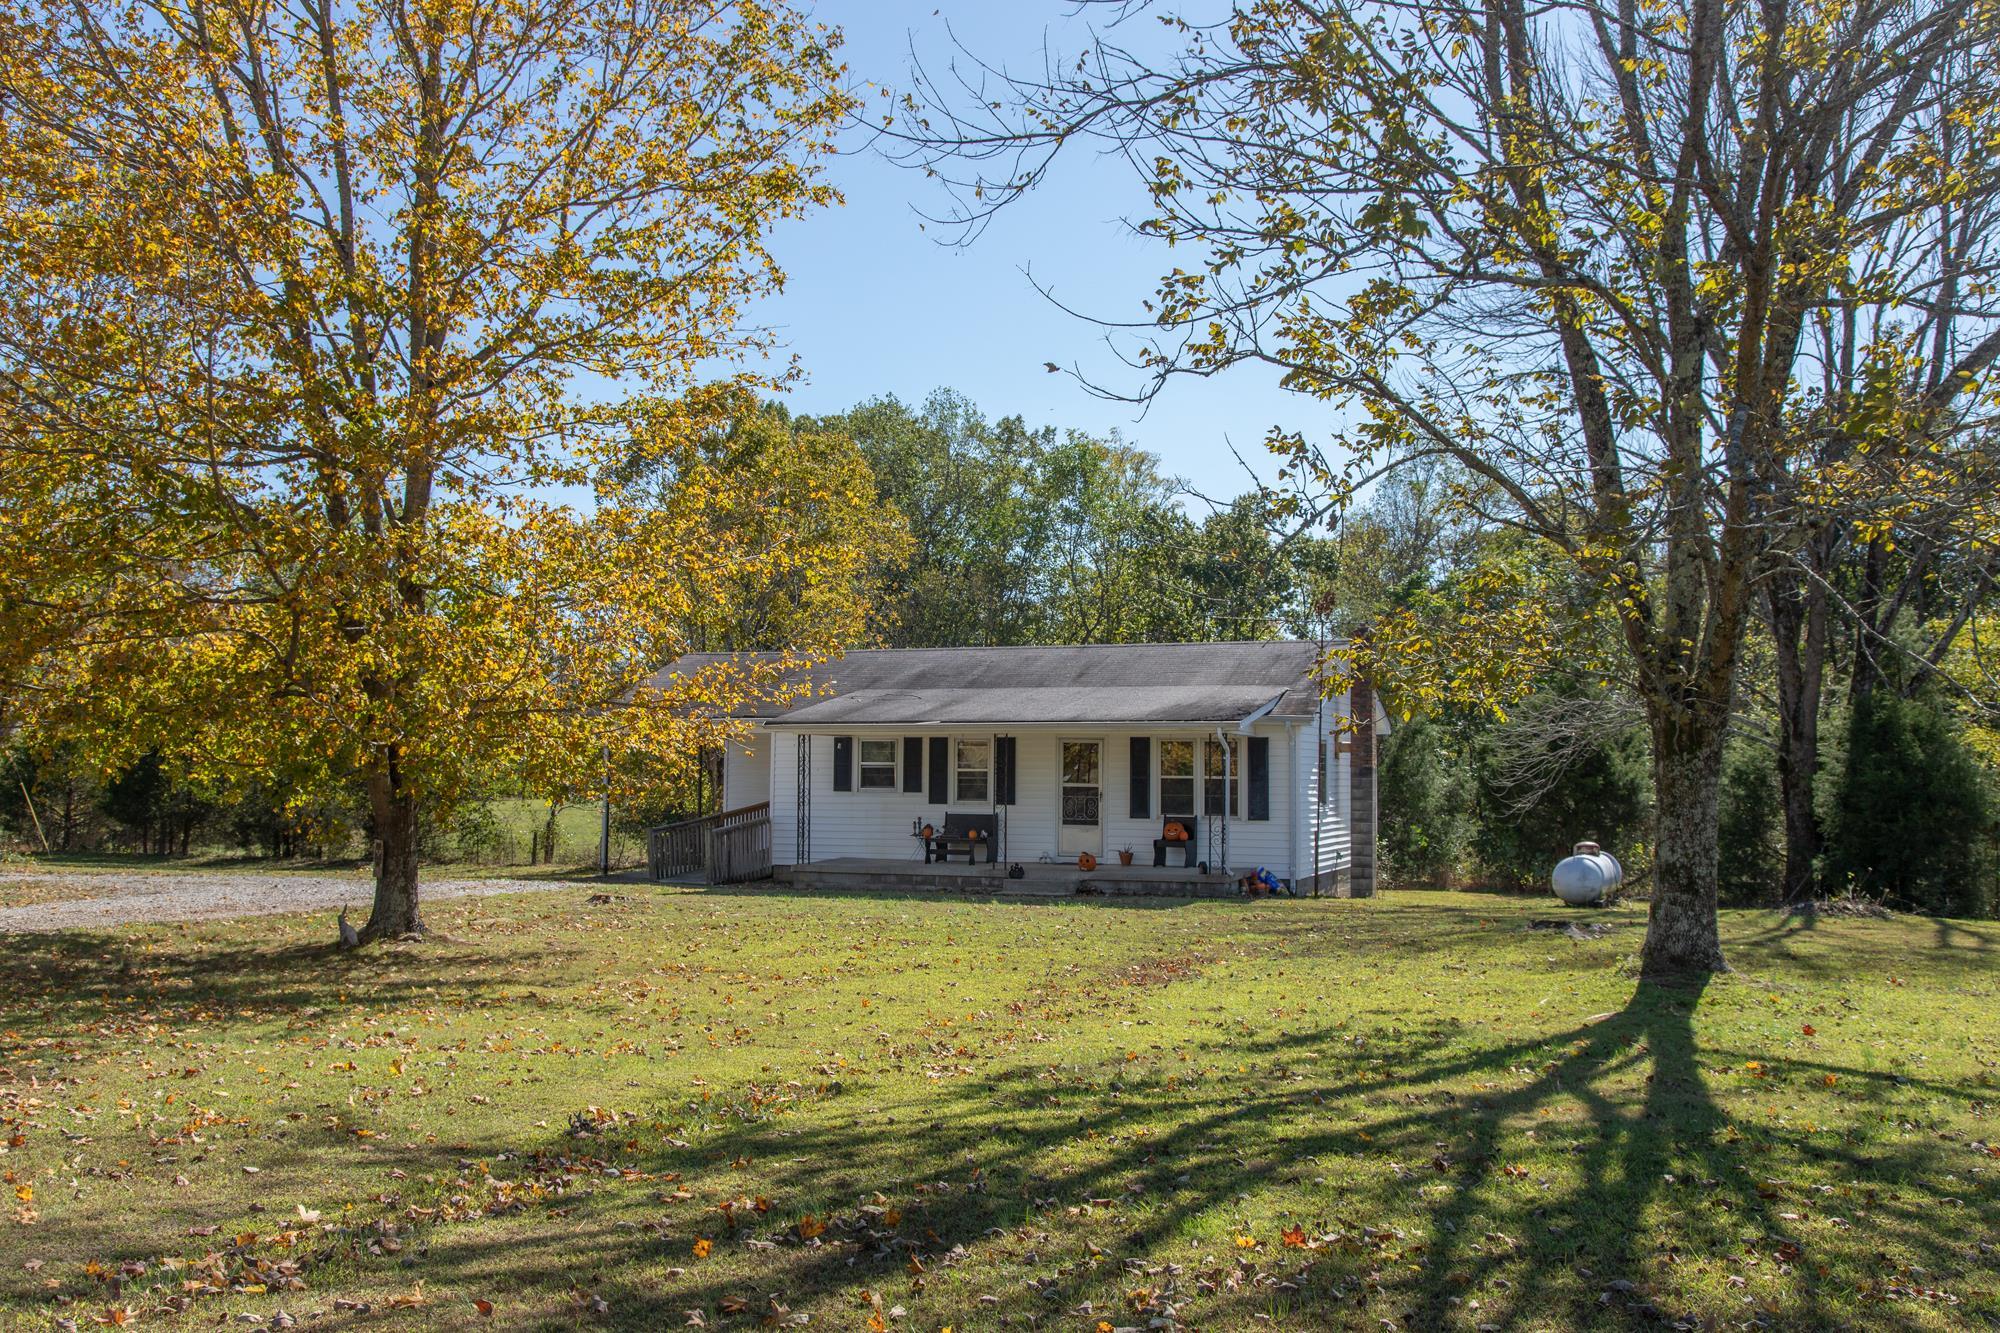 2435 Mobley Ridge Rd, Duck River, TN 38454 - Duck River, TN real estate listing